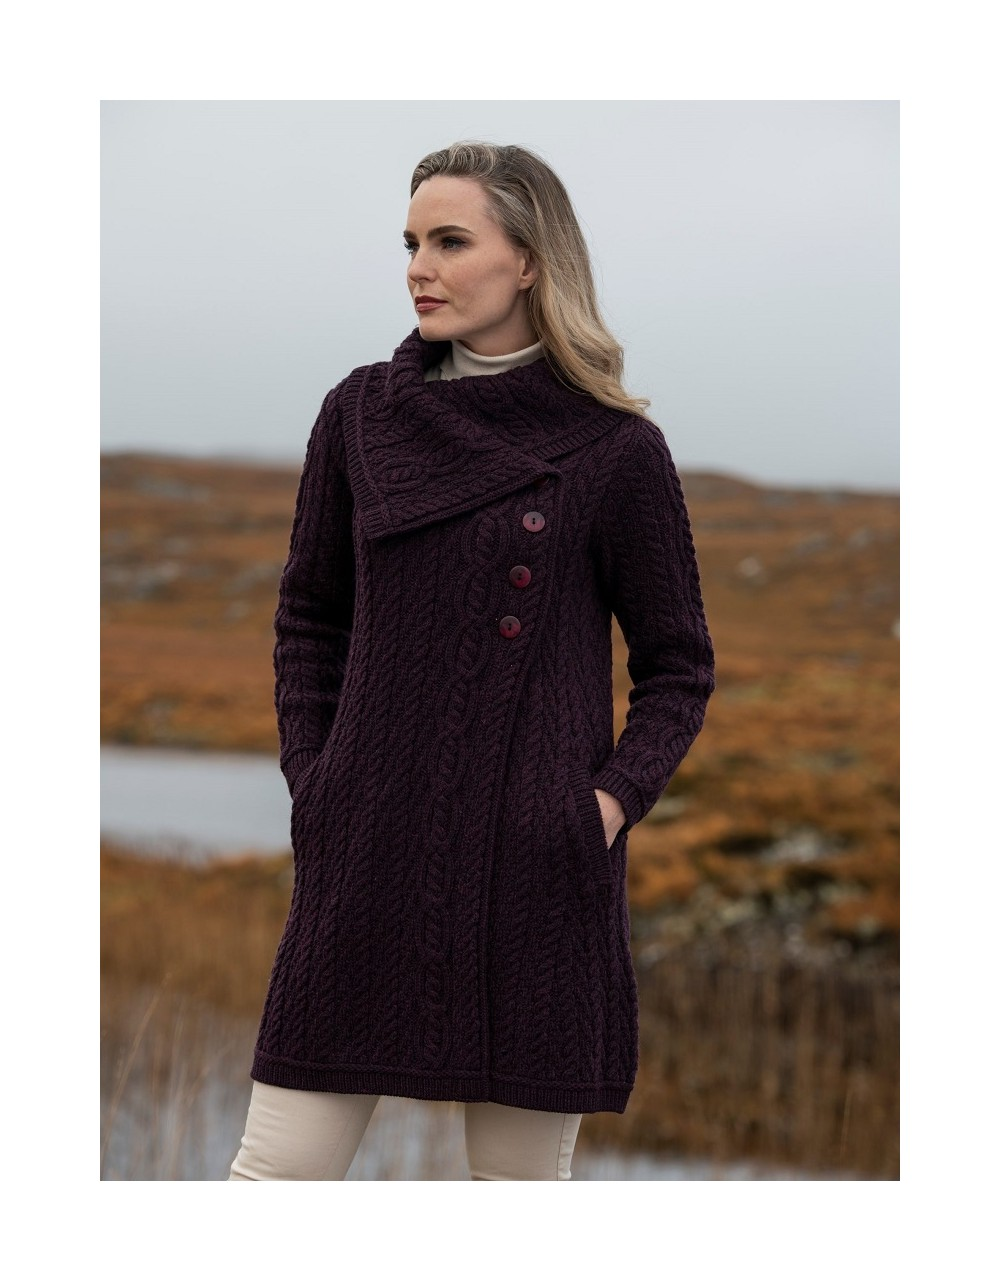 Aran Style Large Collar Coat Damson Aran Knitwear Coats Irish Handcrafts